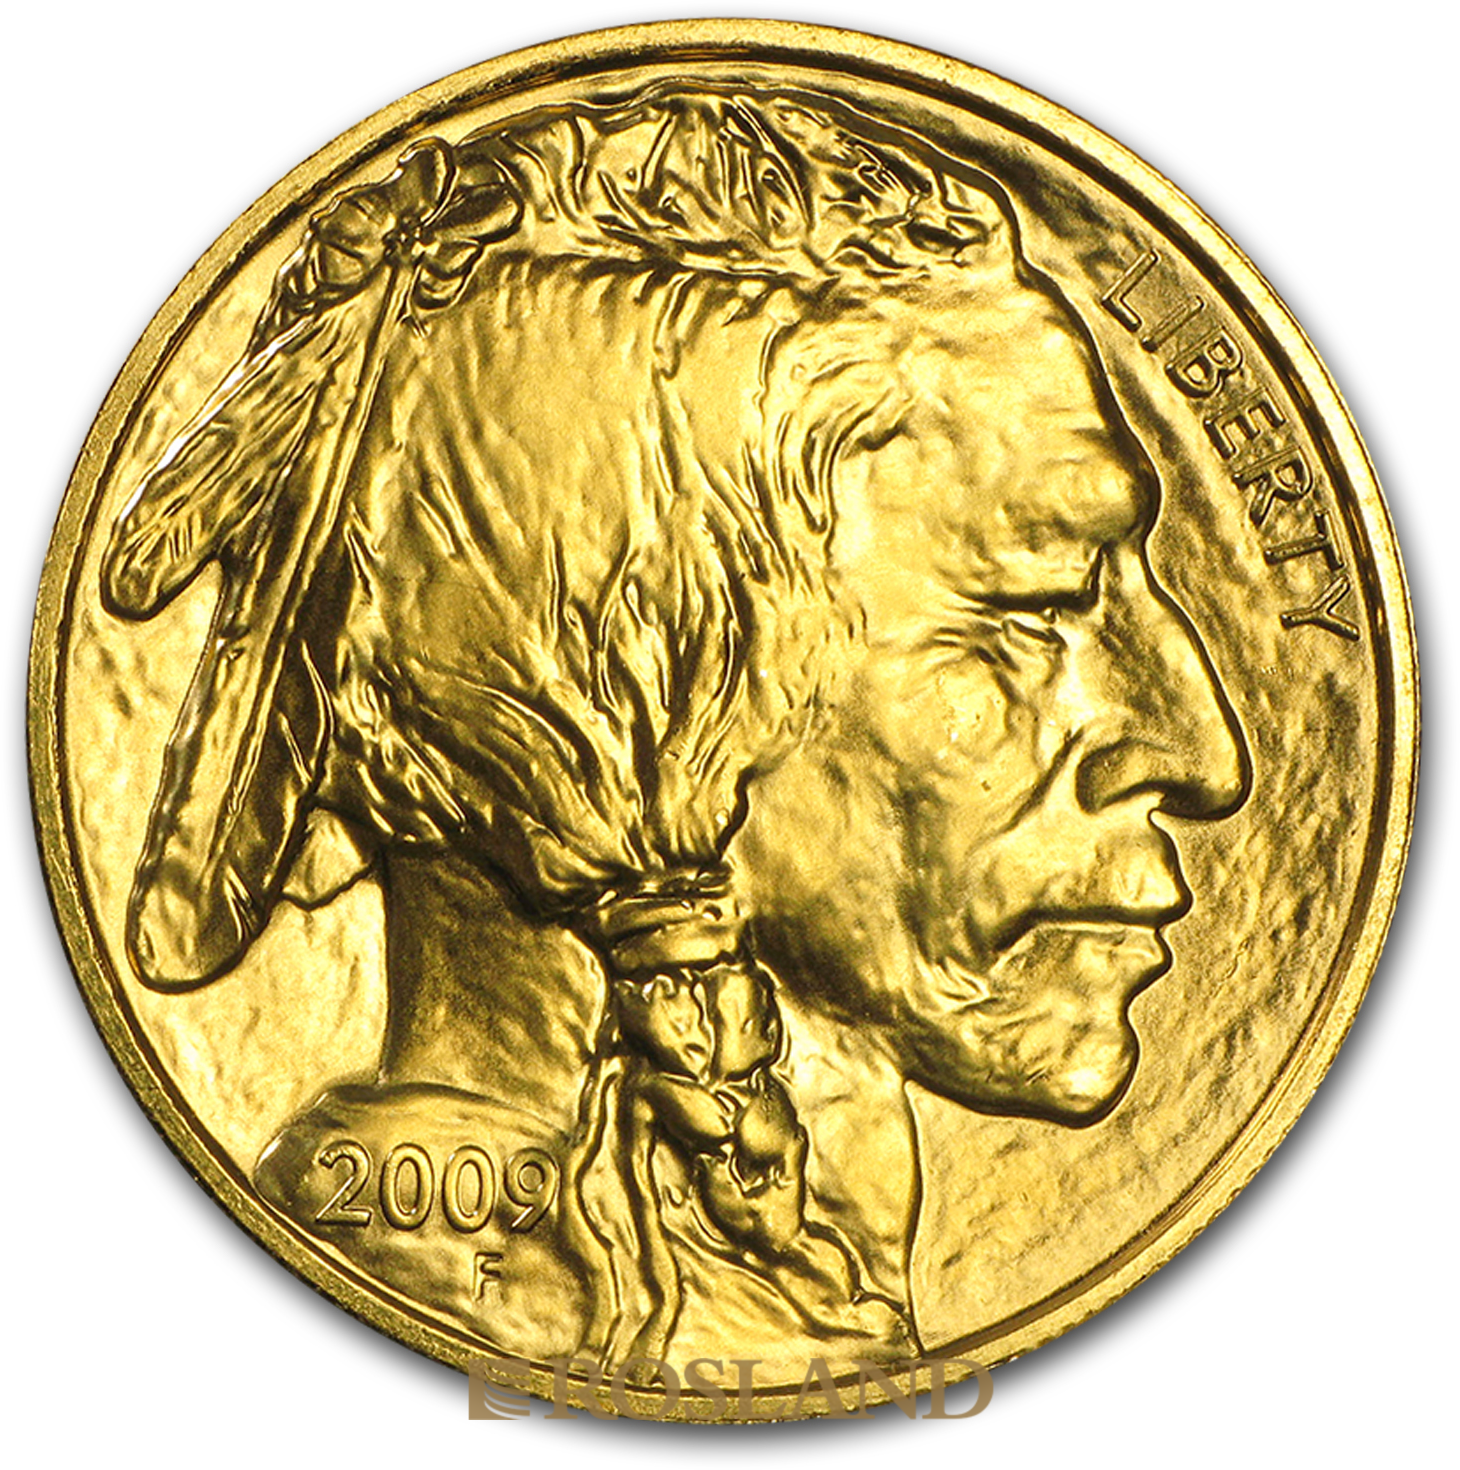 1 Unze Goldmünze American Buffalo 2009